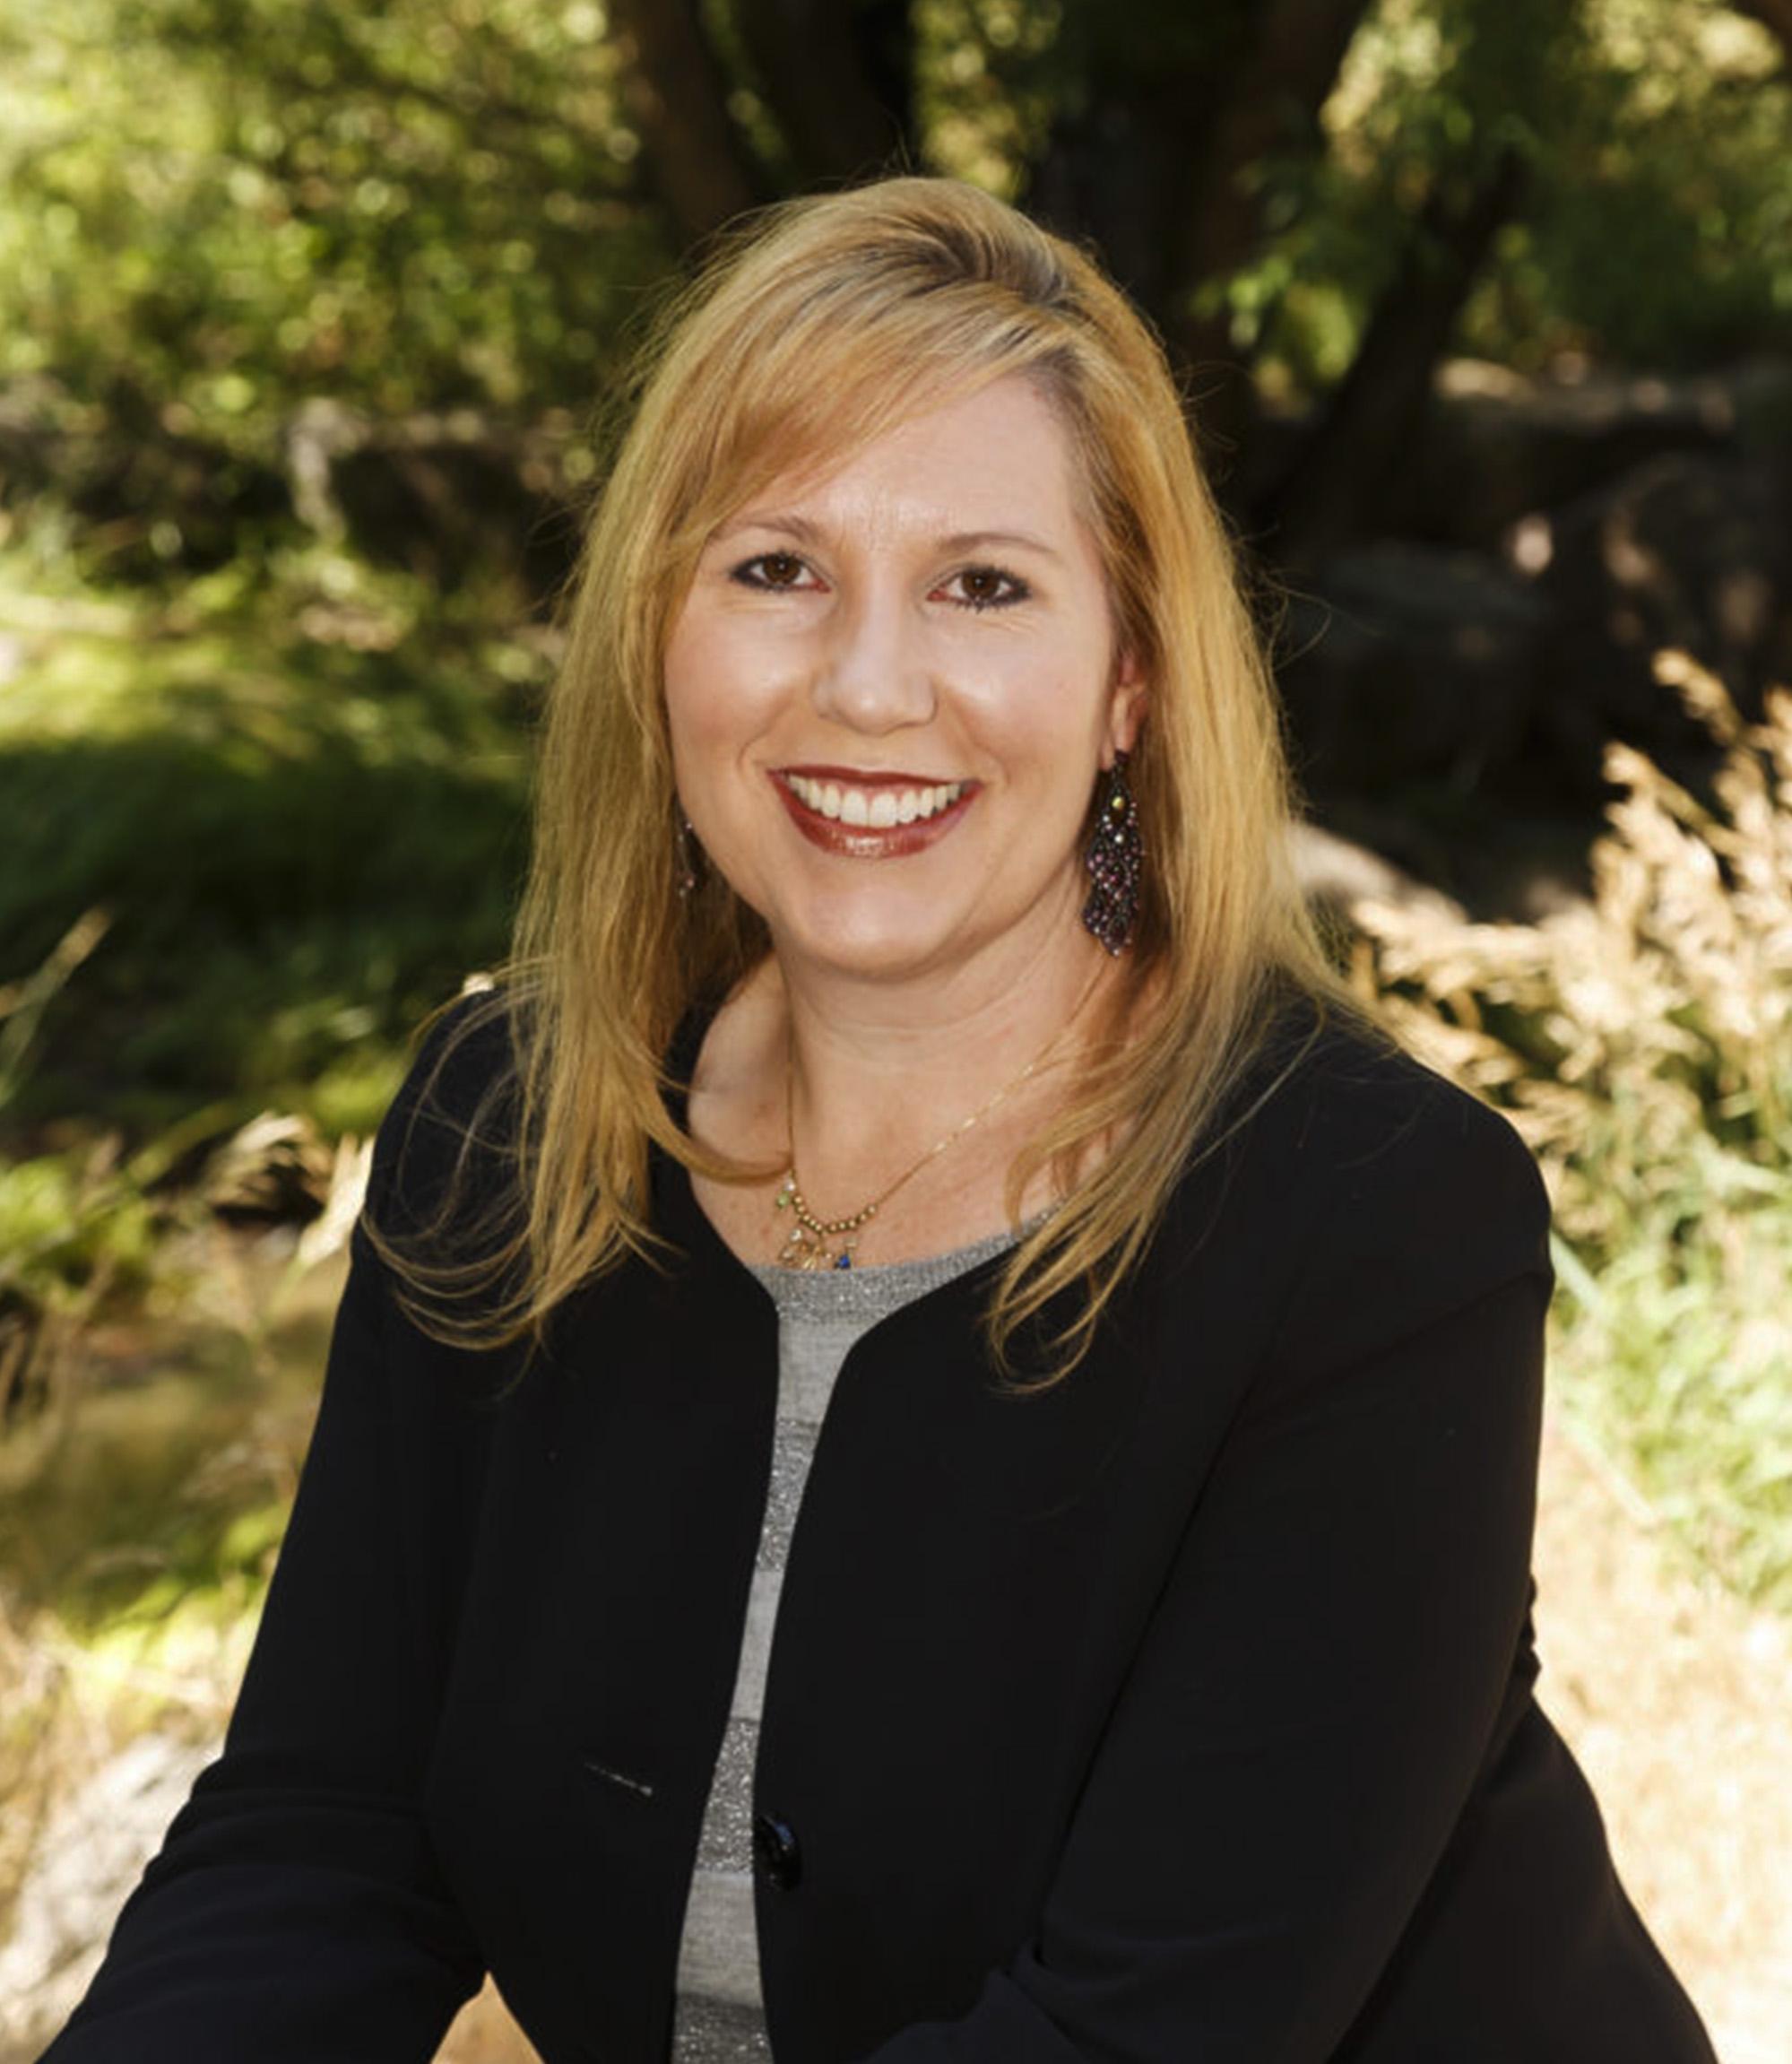 Family Law Attorney Tina Ellmann